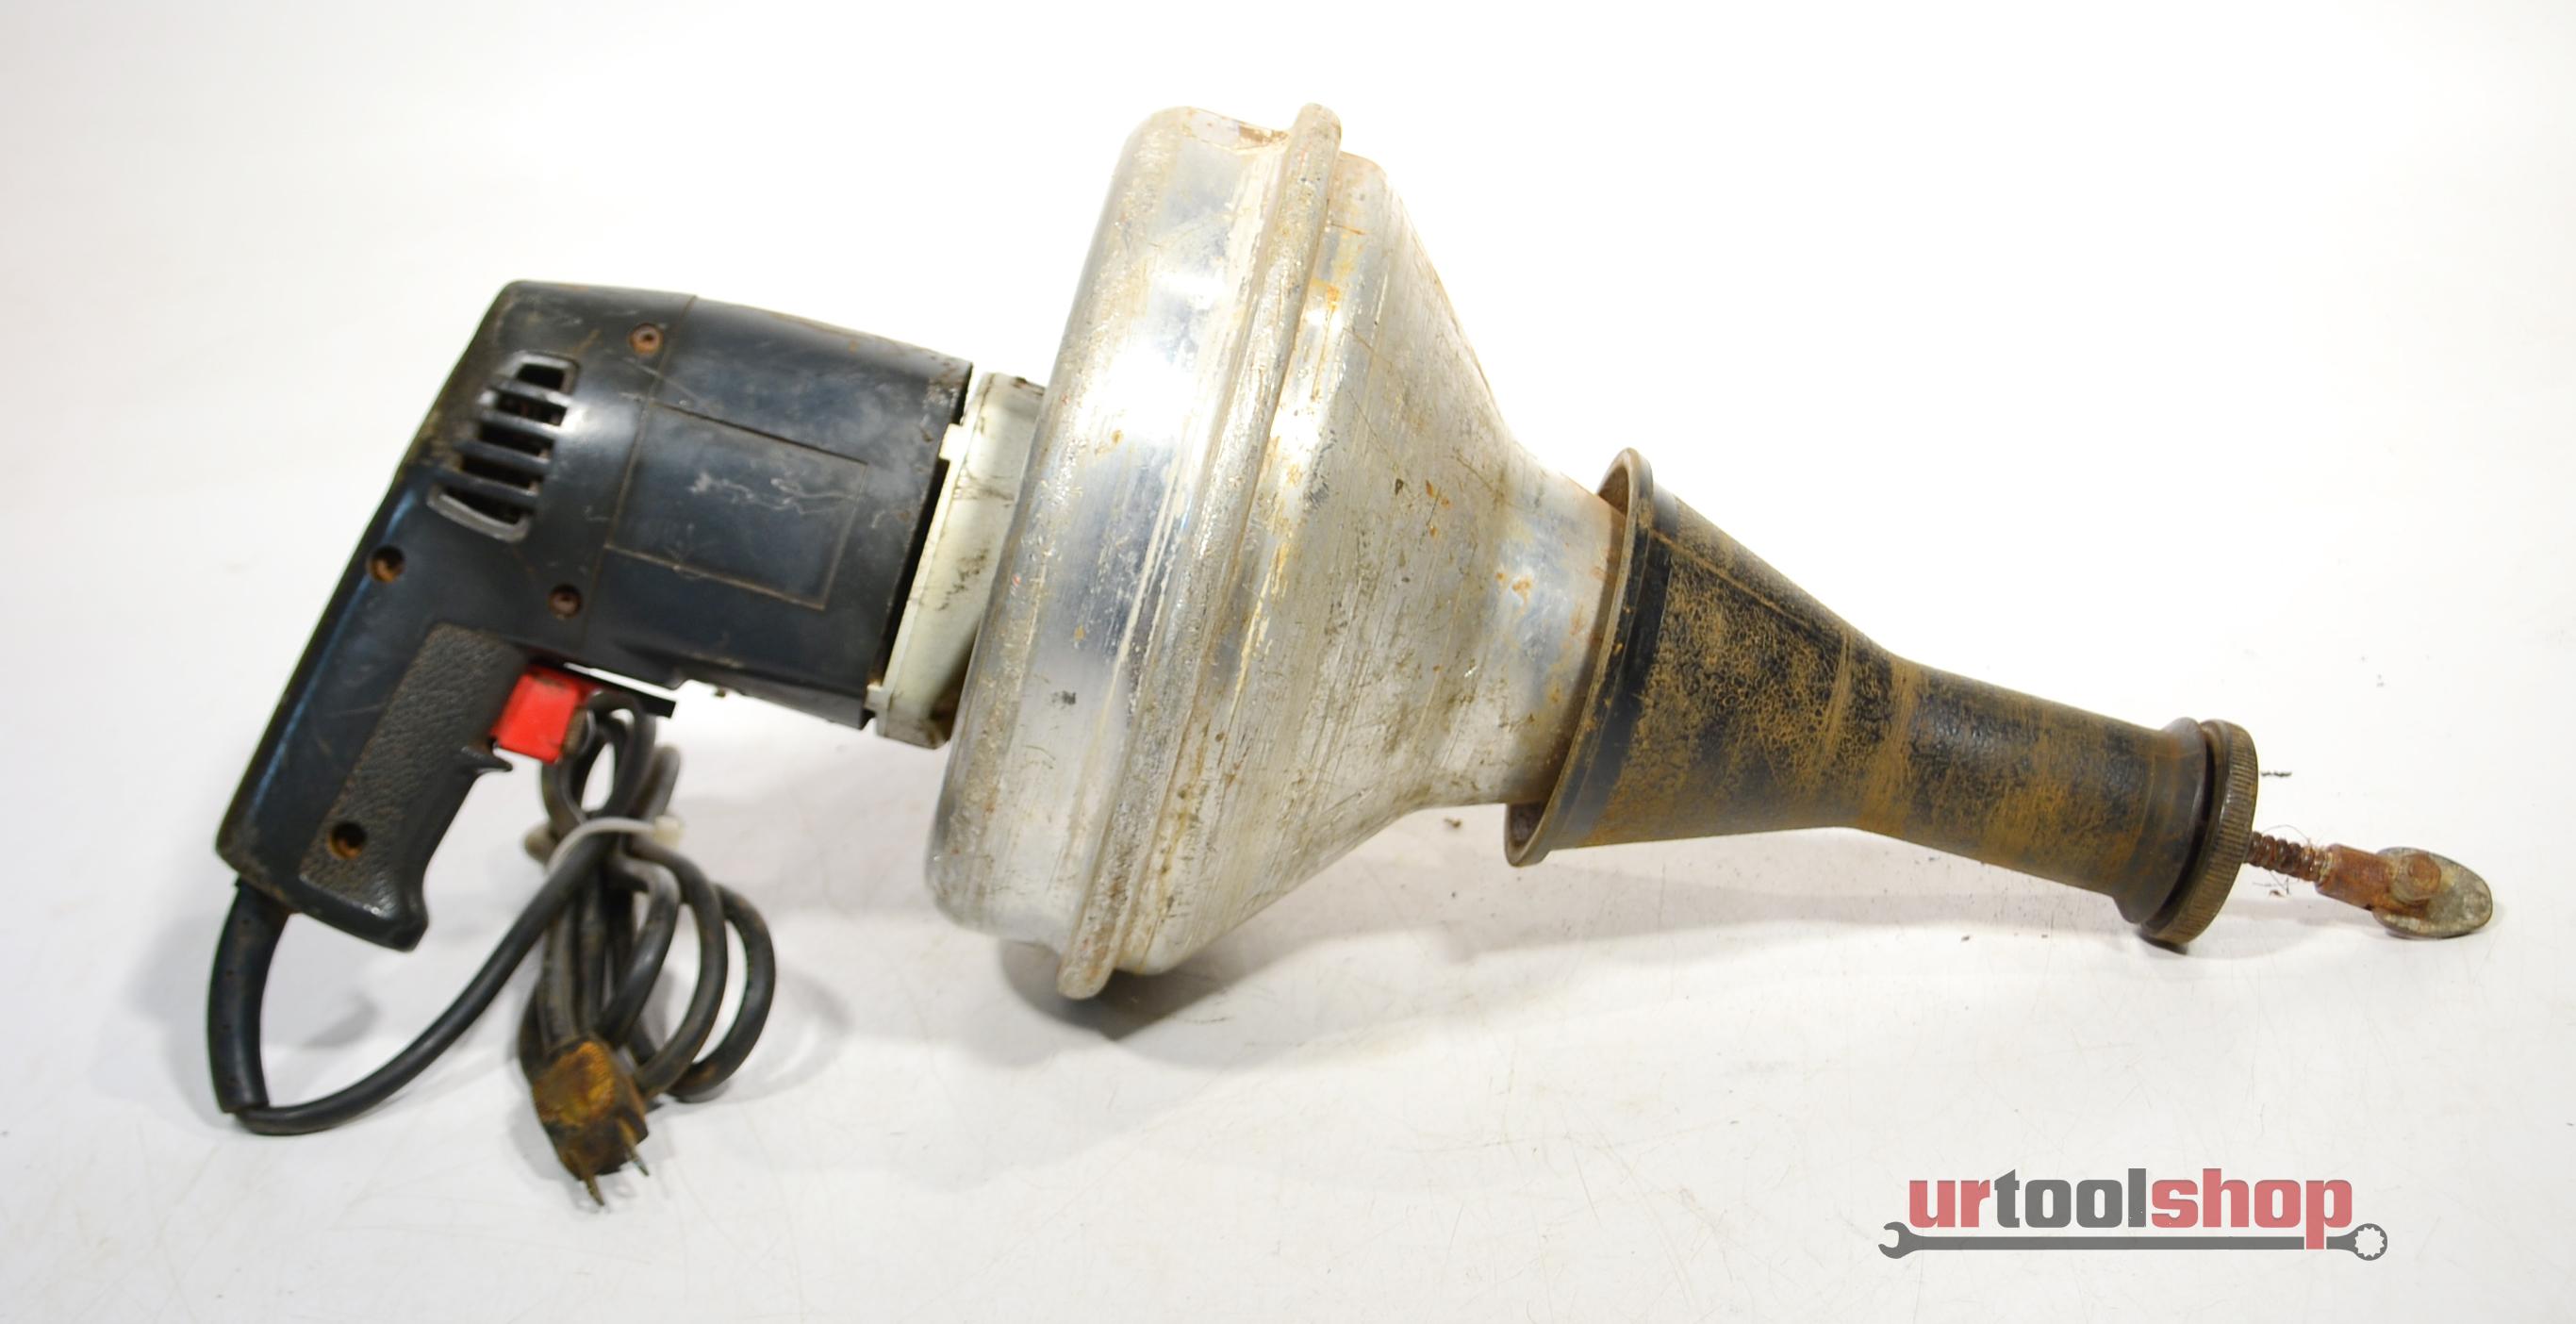 Ridgid Kollmann Hand Held Electric Drain Cleaner Sewer